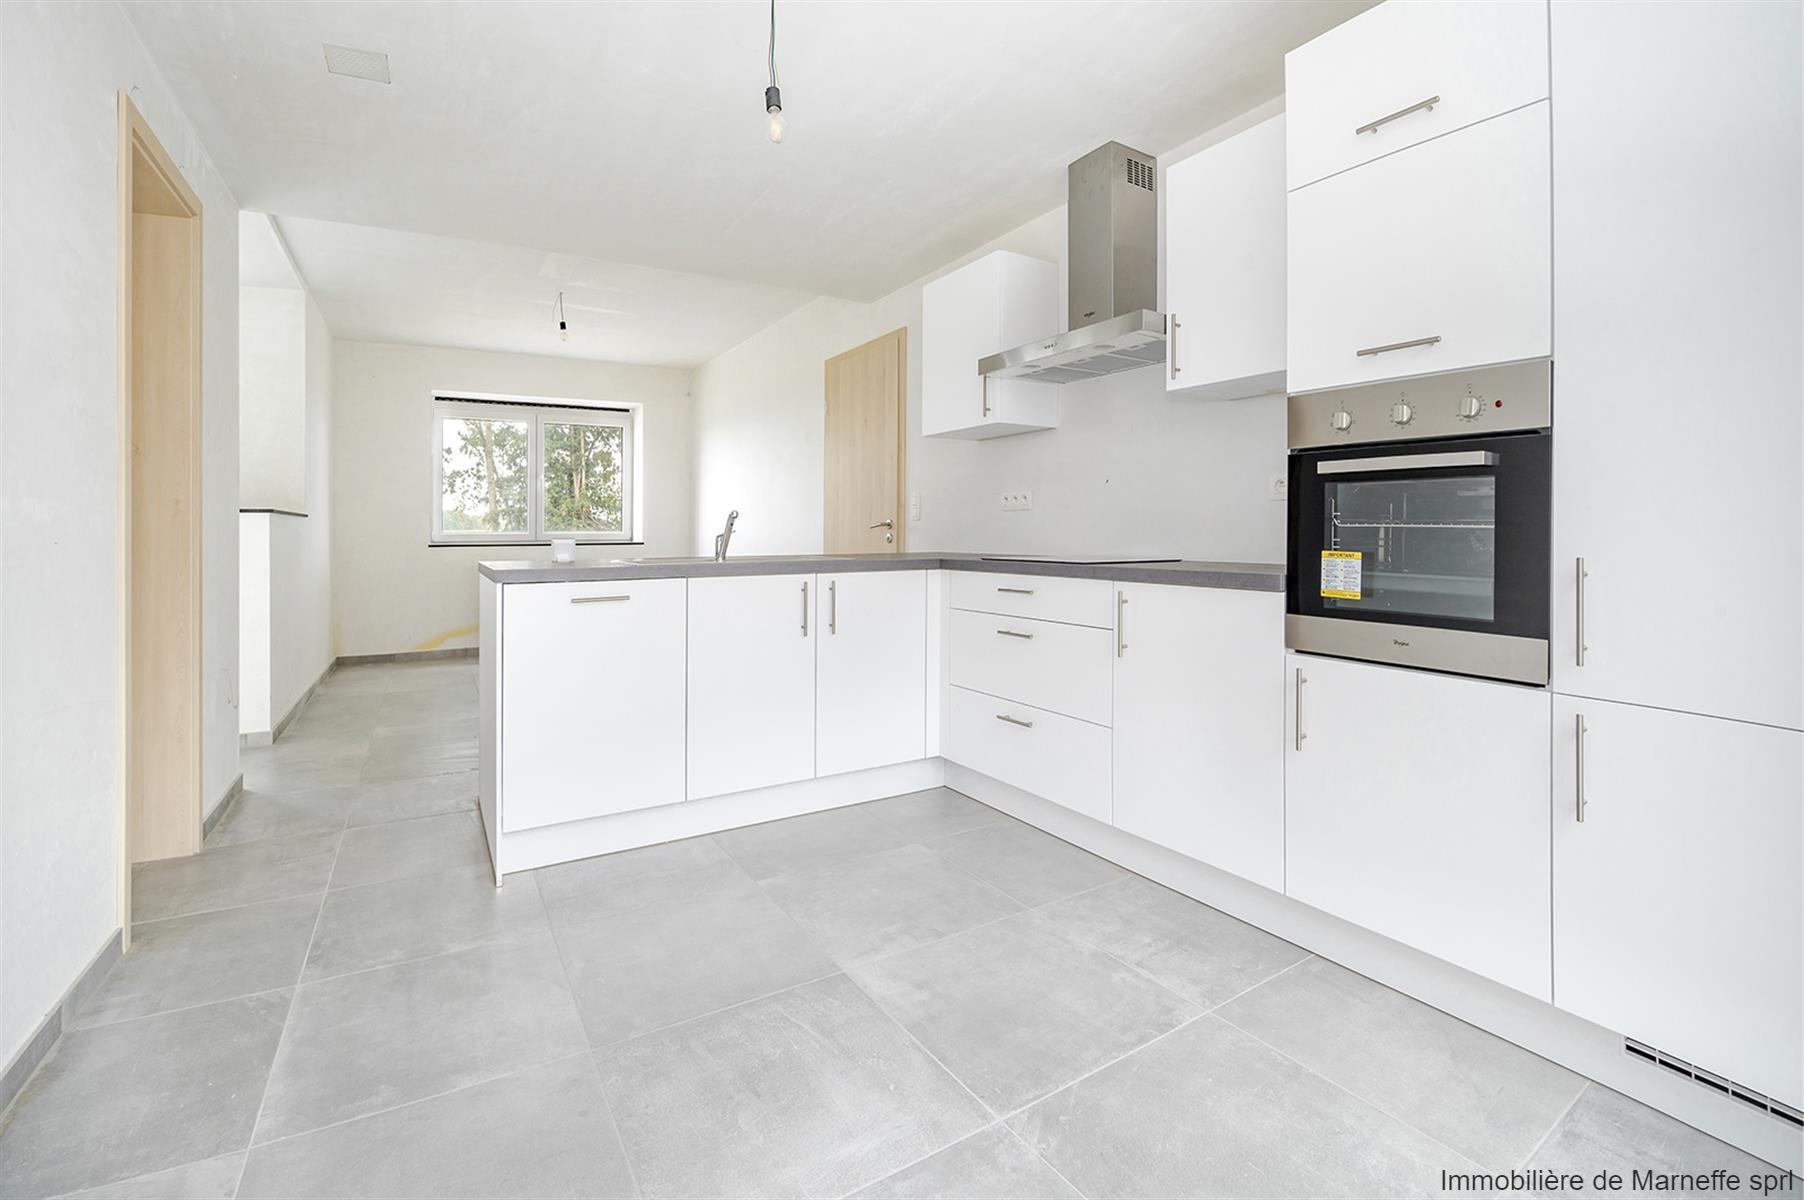 Appartement - Faimes - #4192731-1